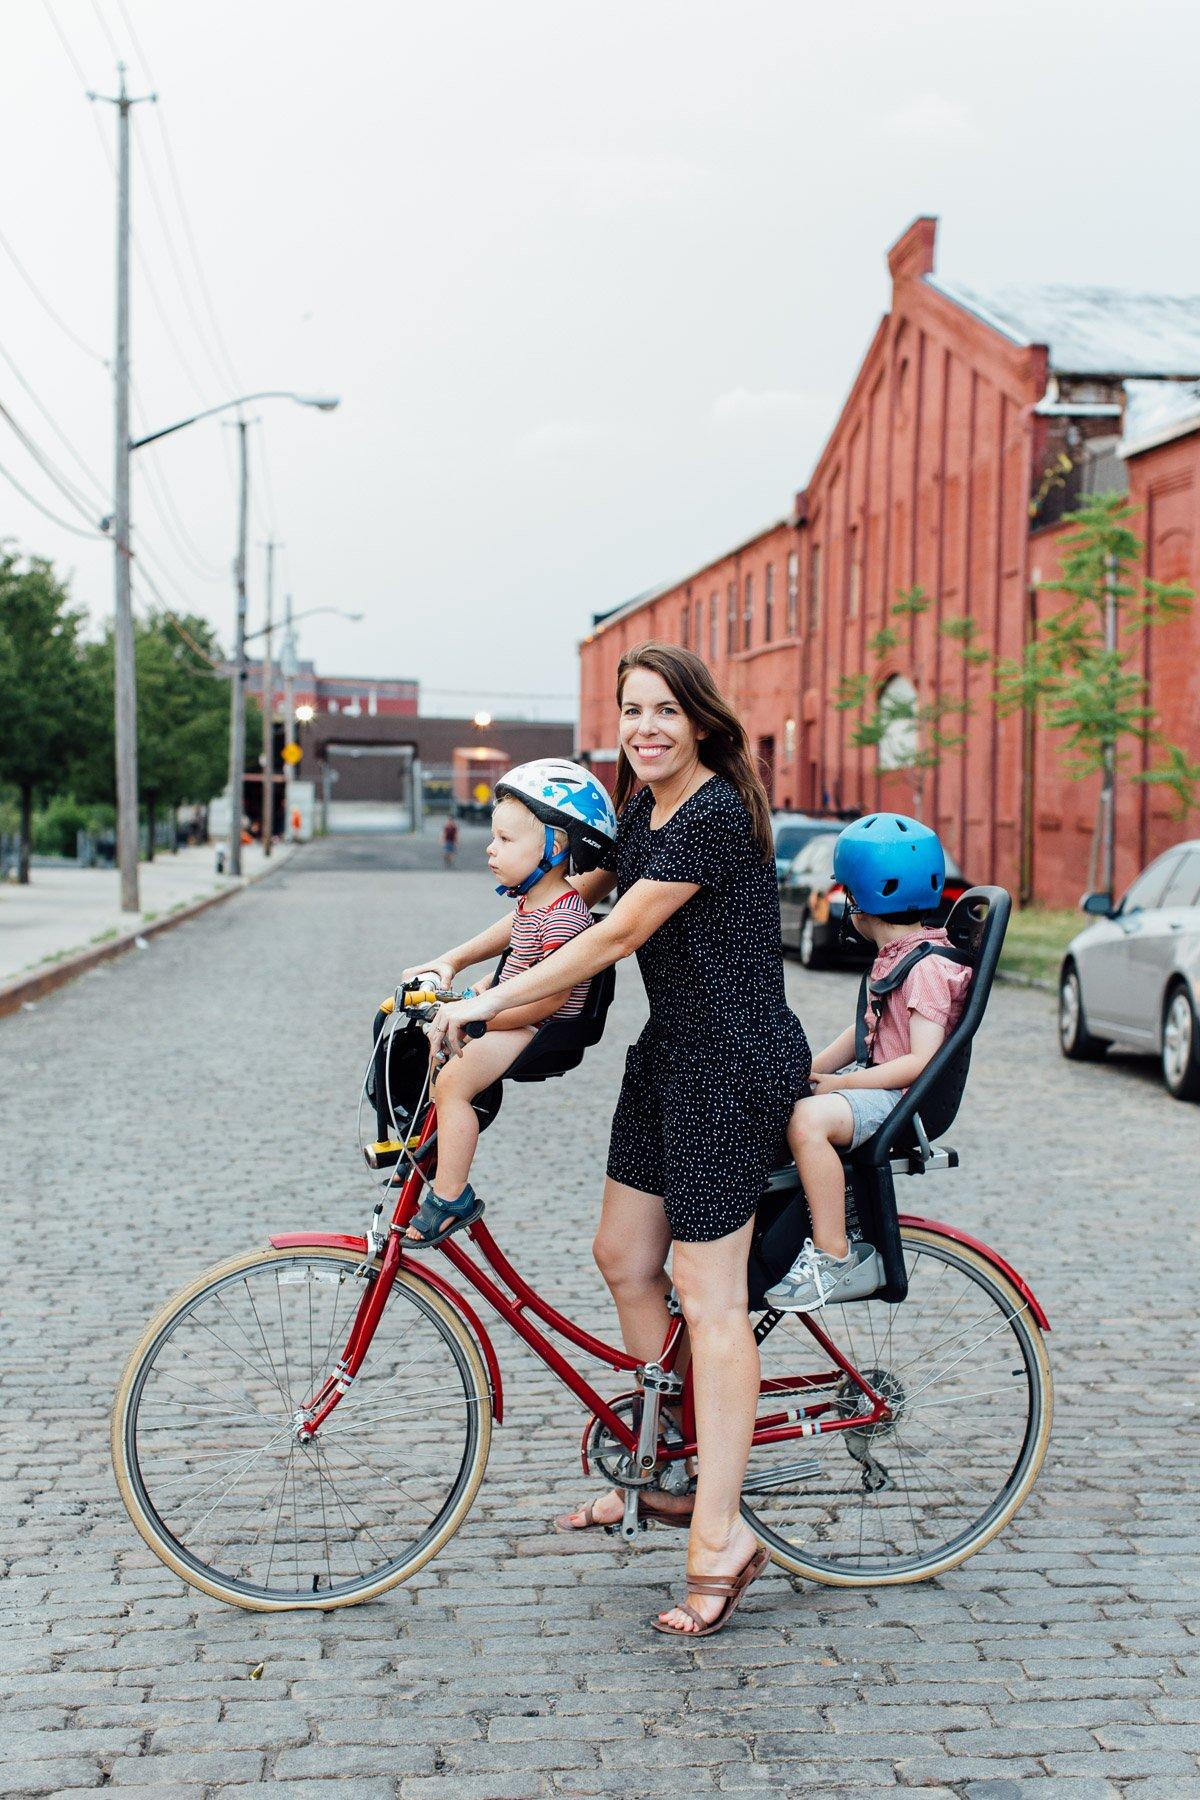 Biking With Kids | A Cup of Jo